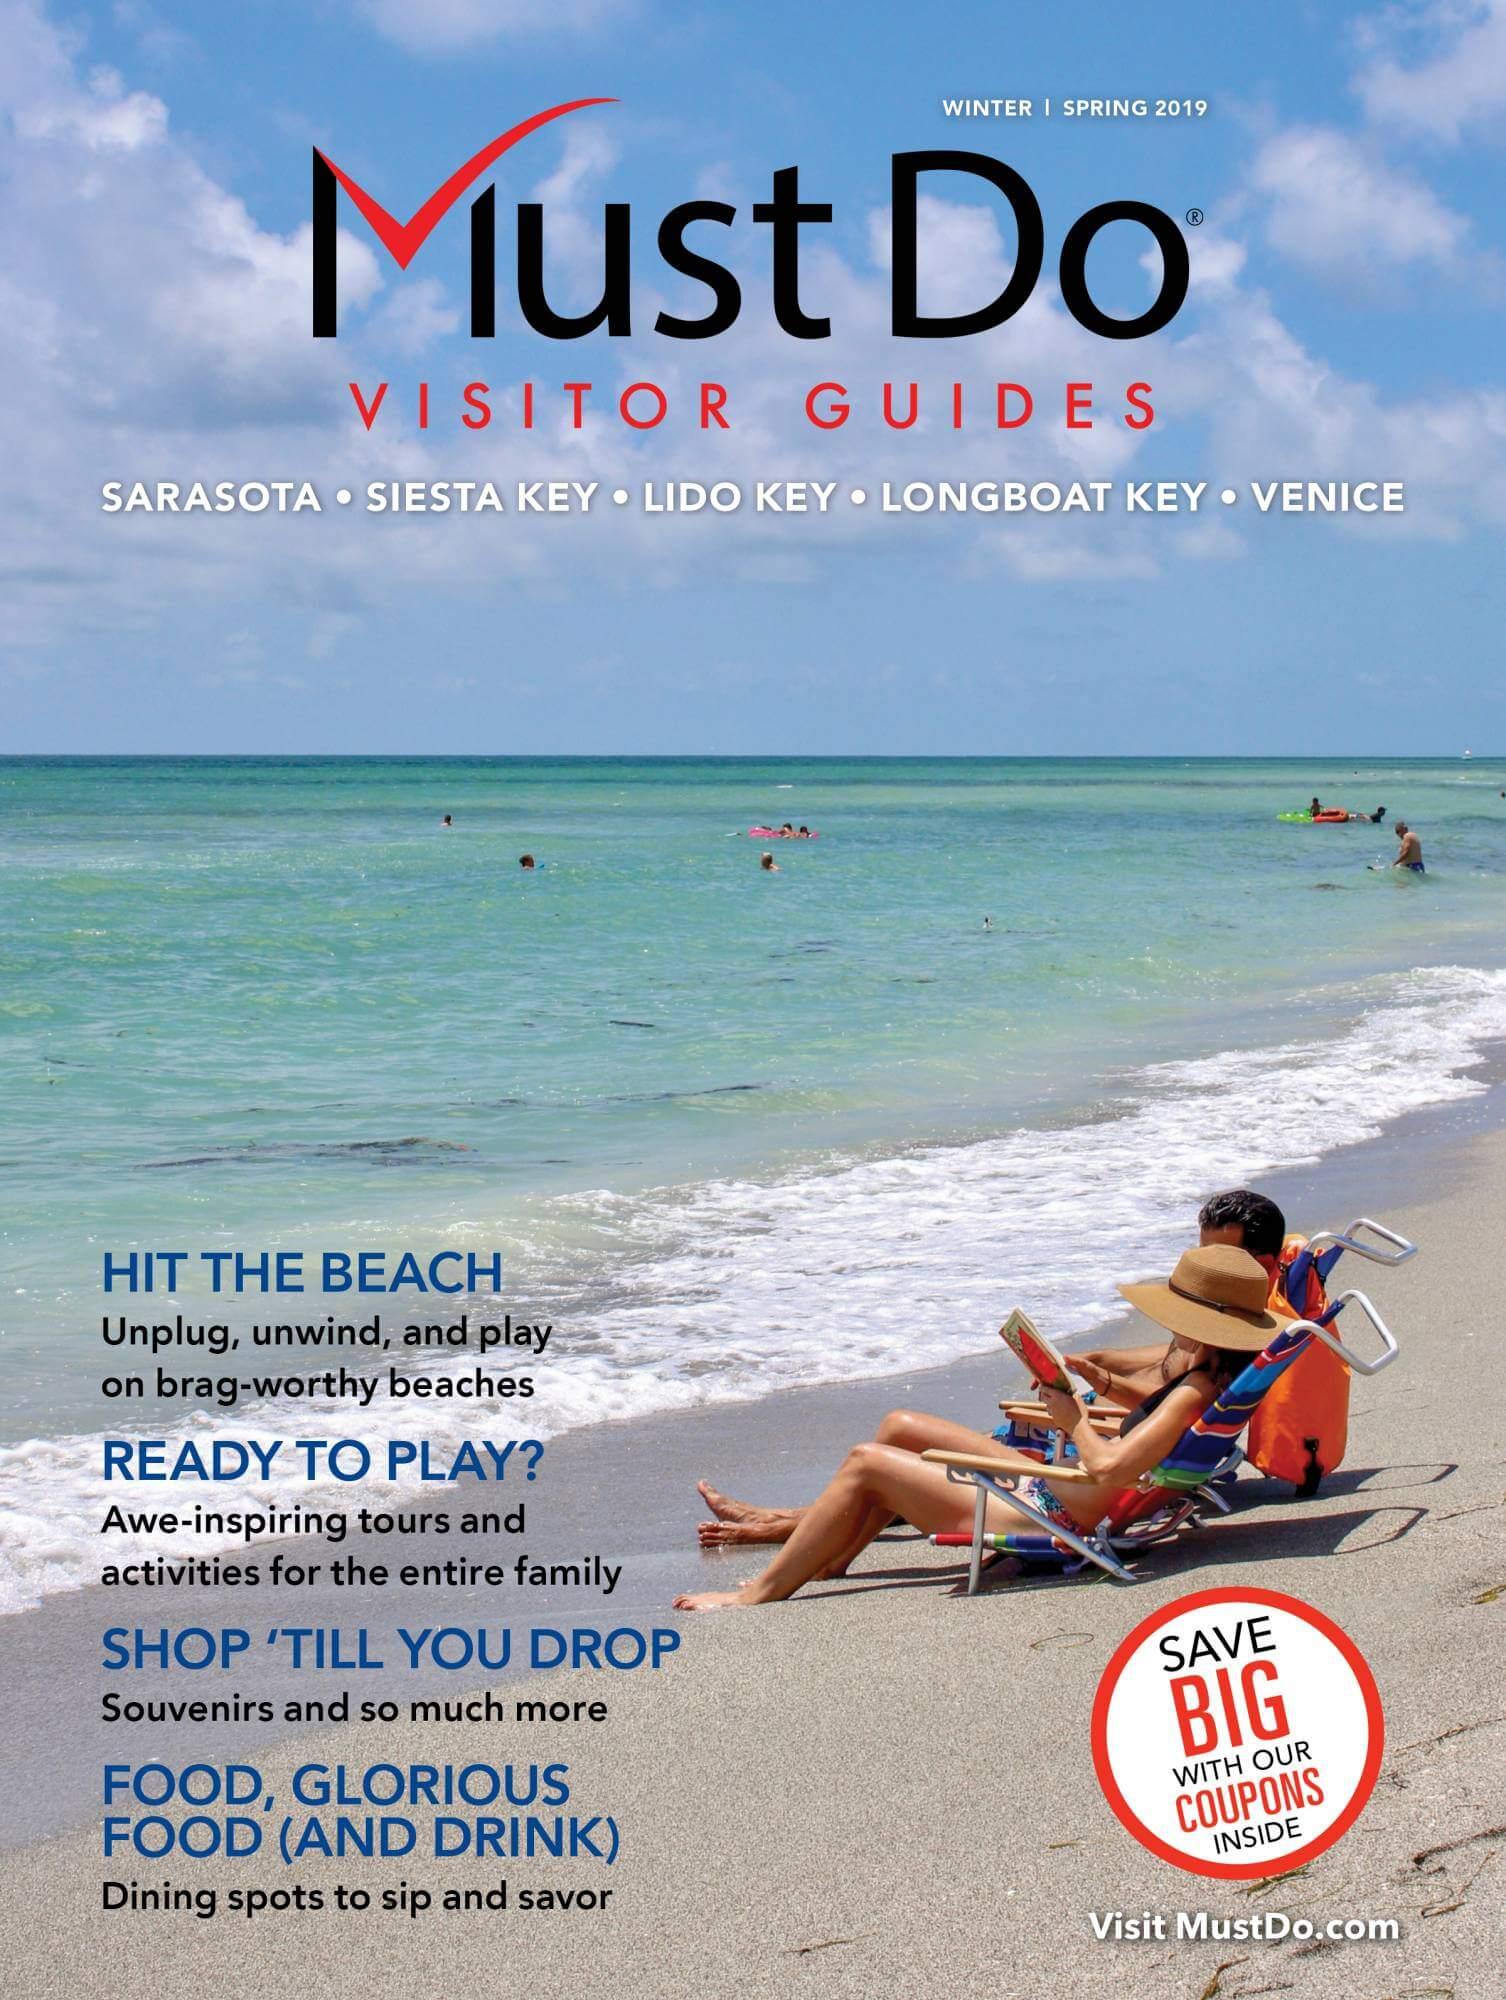 Sarasota Must Do Visitor Guides winter/Spring 2019